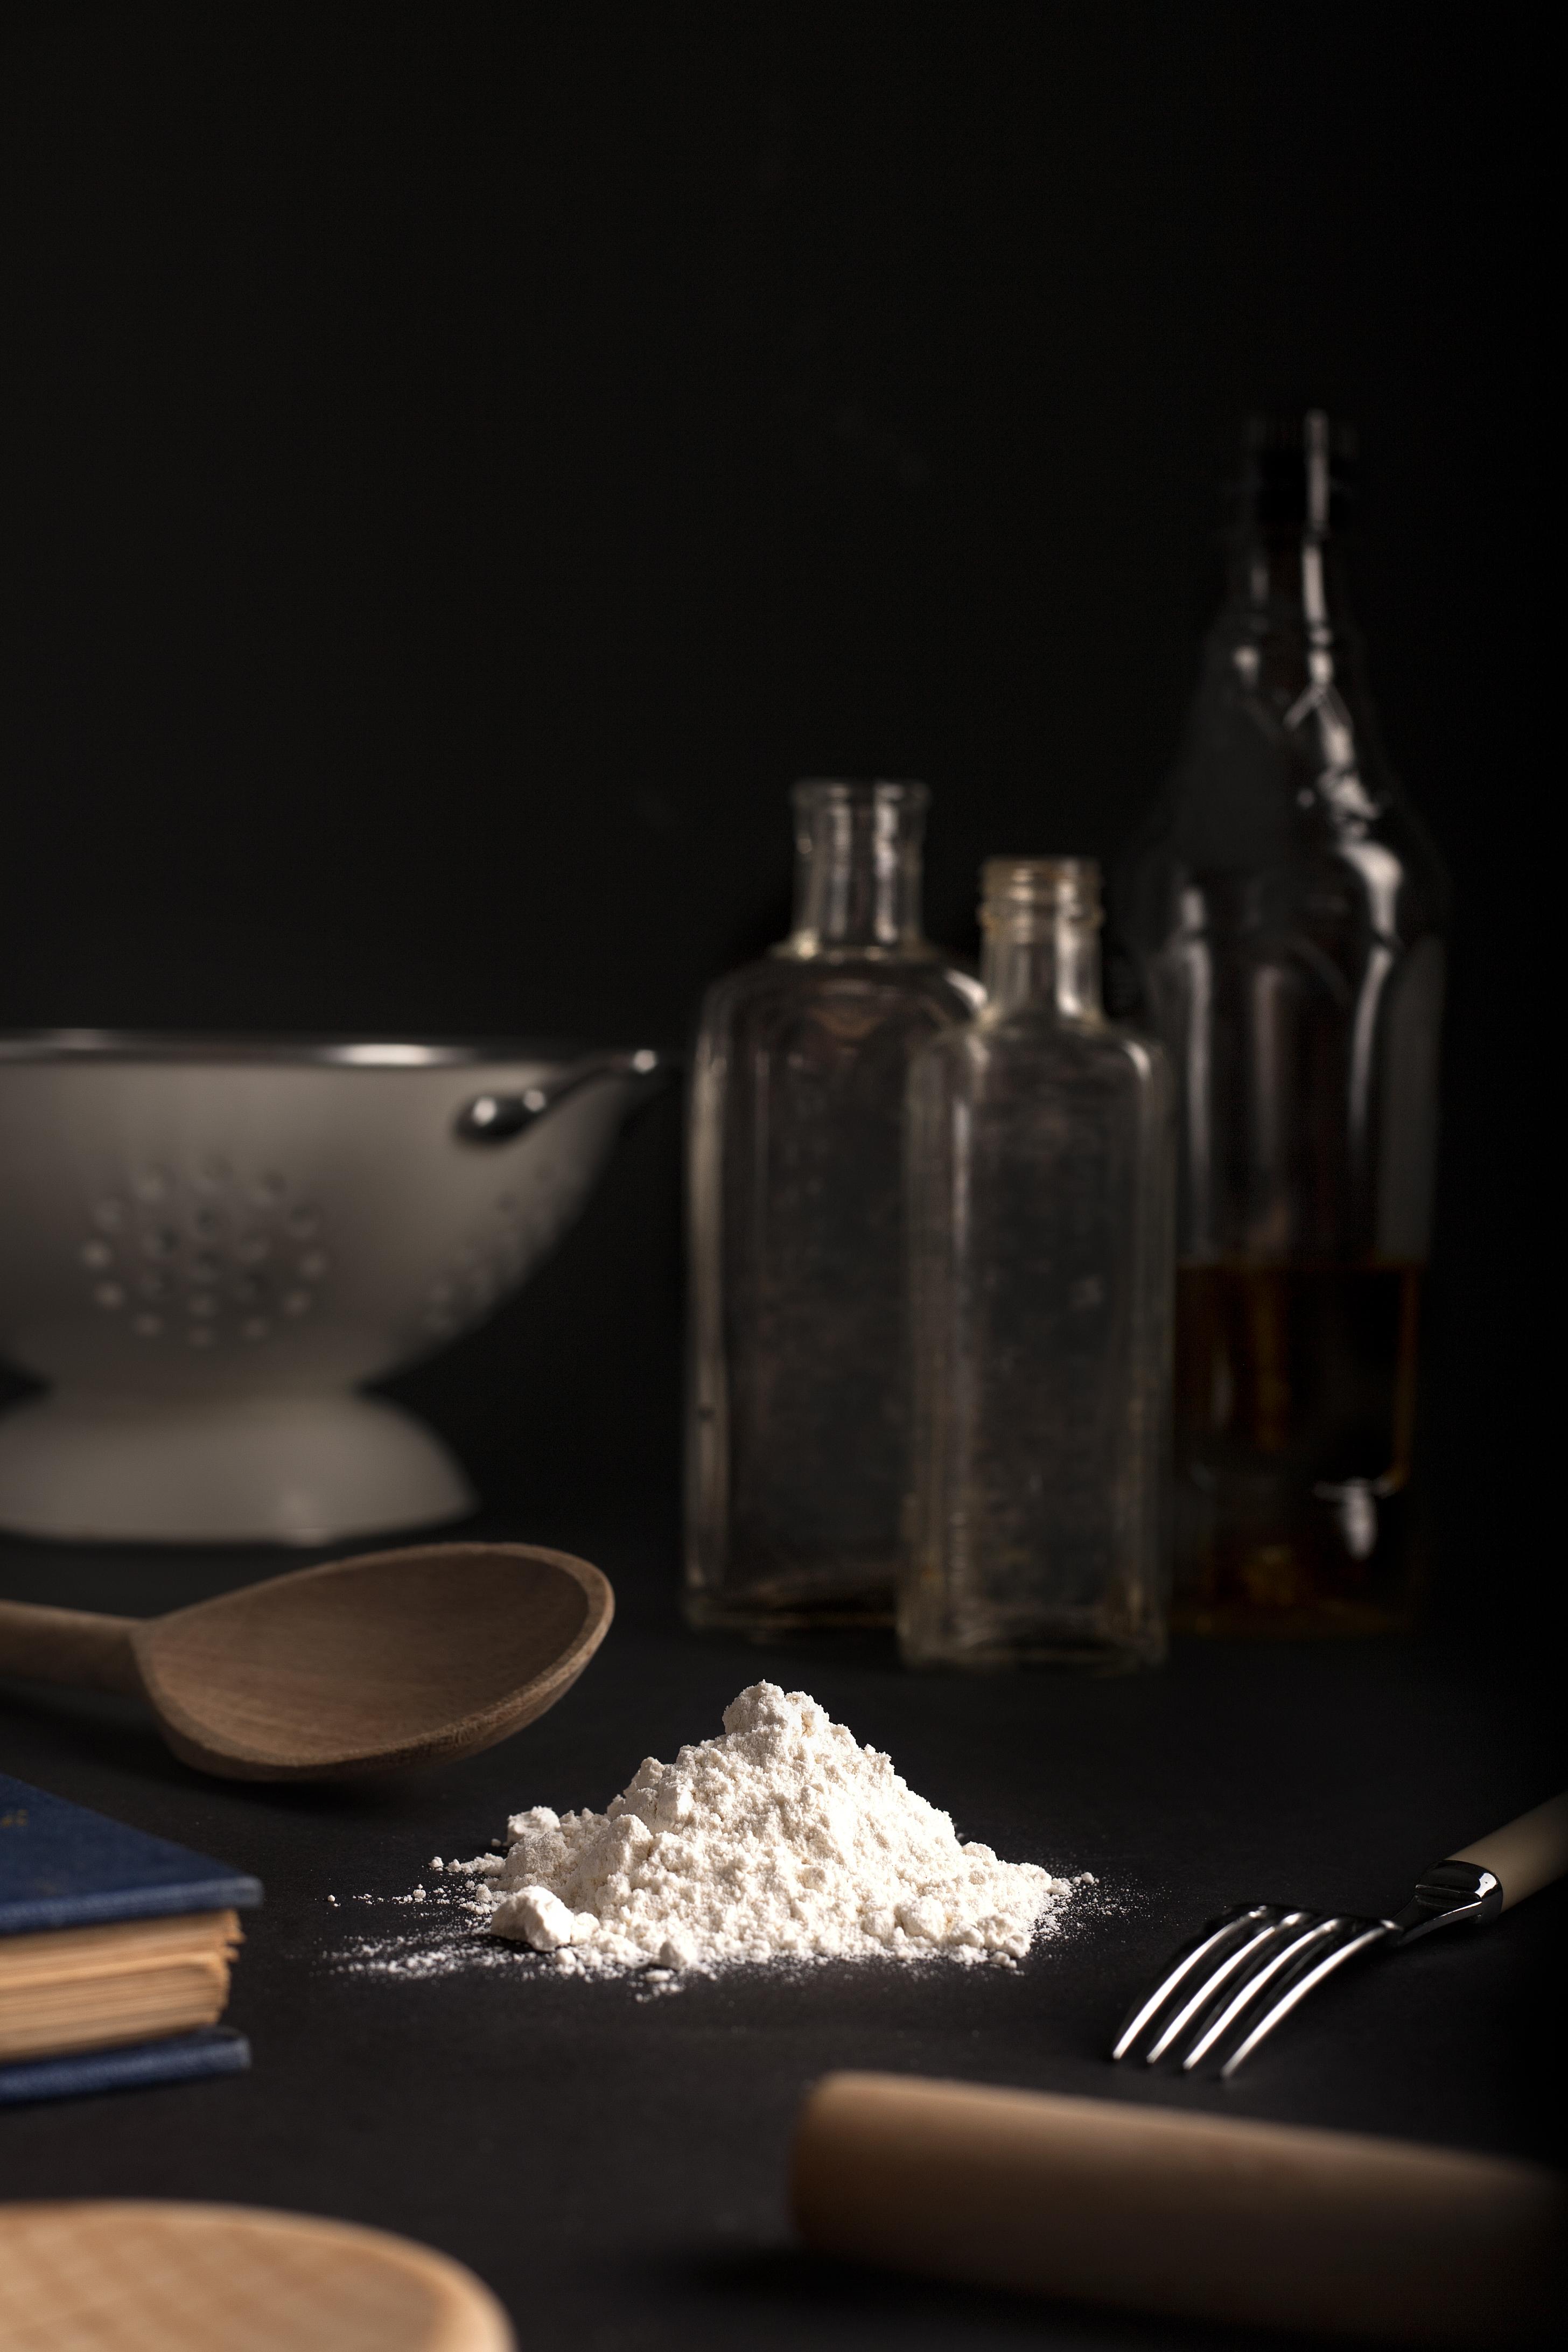 flour by Harry J Bartlett